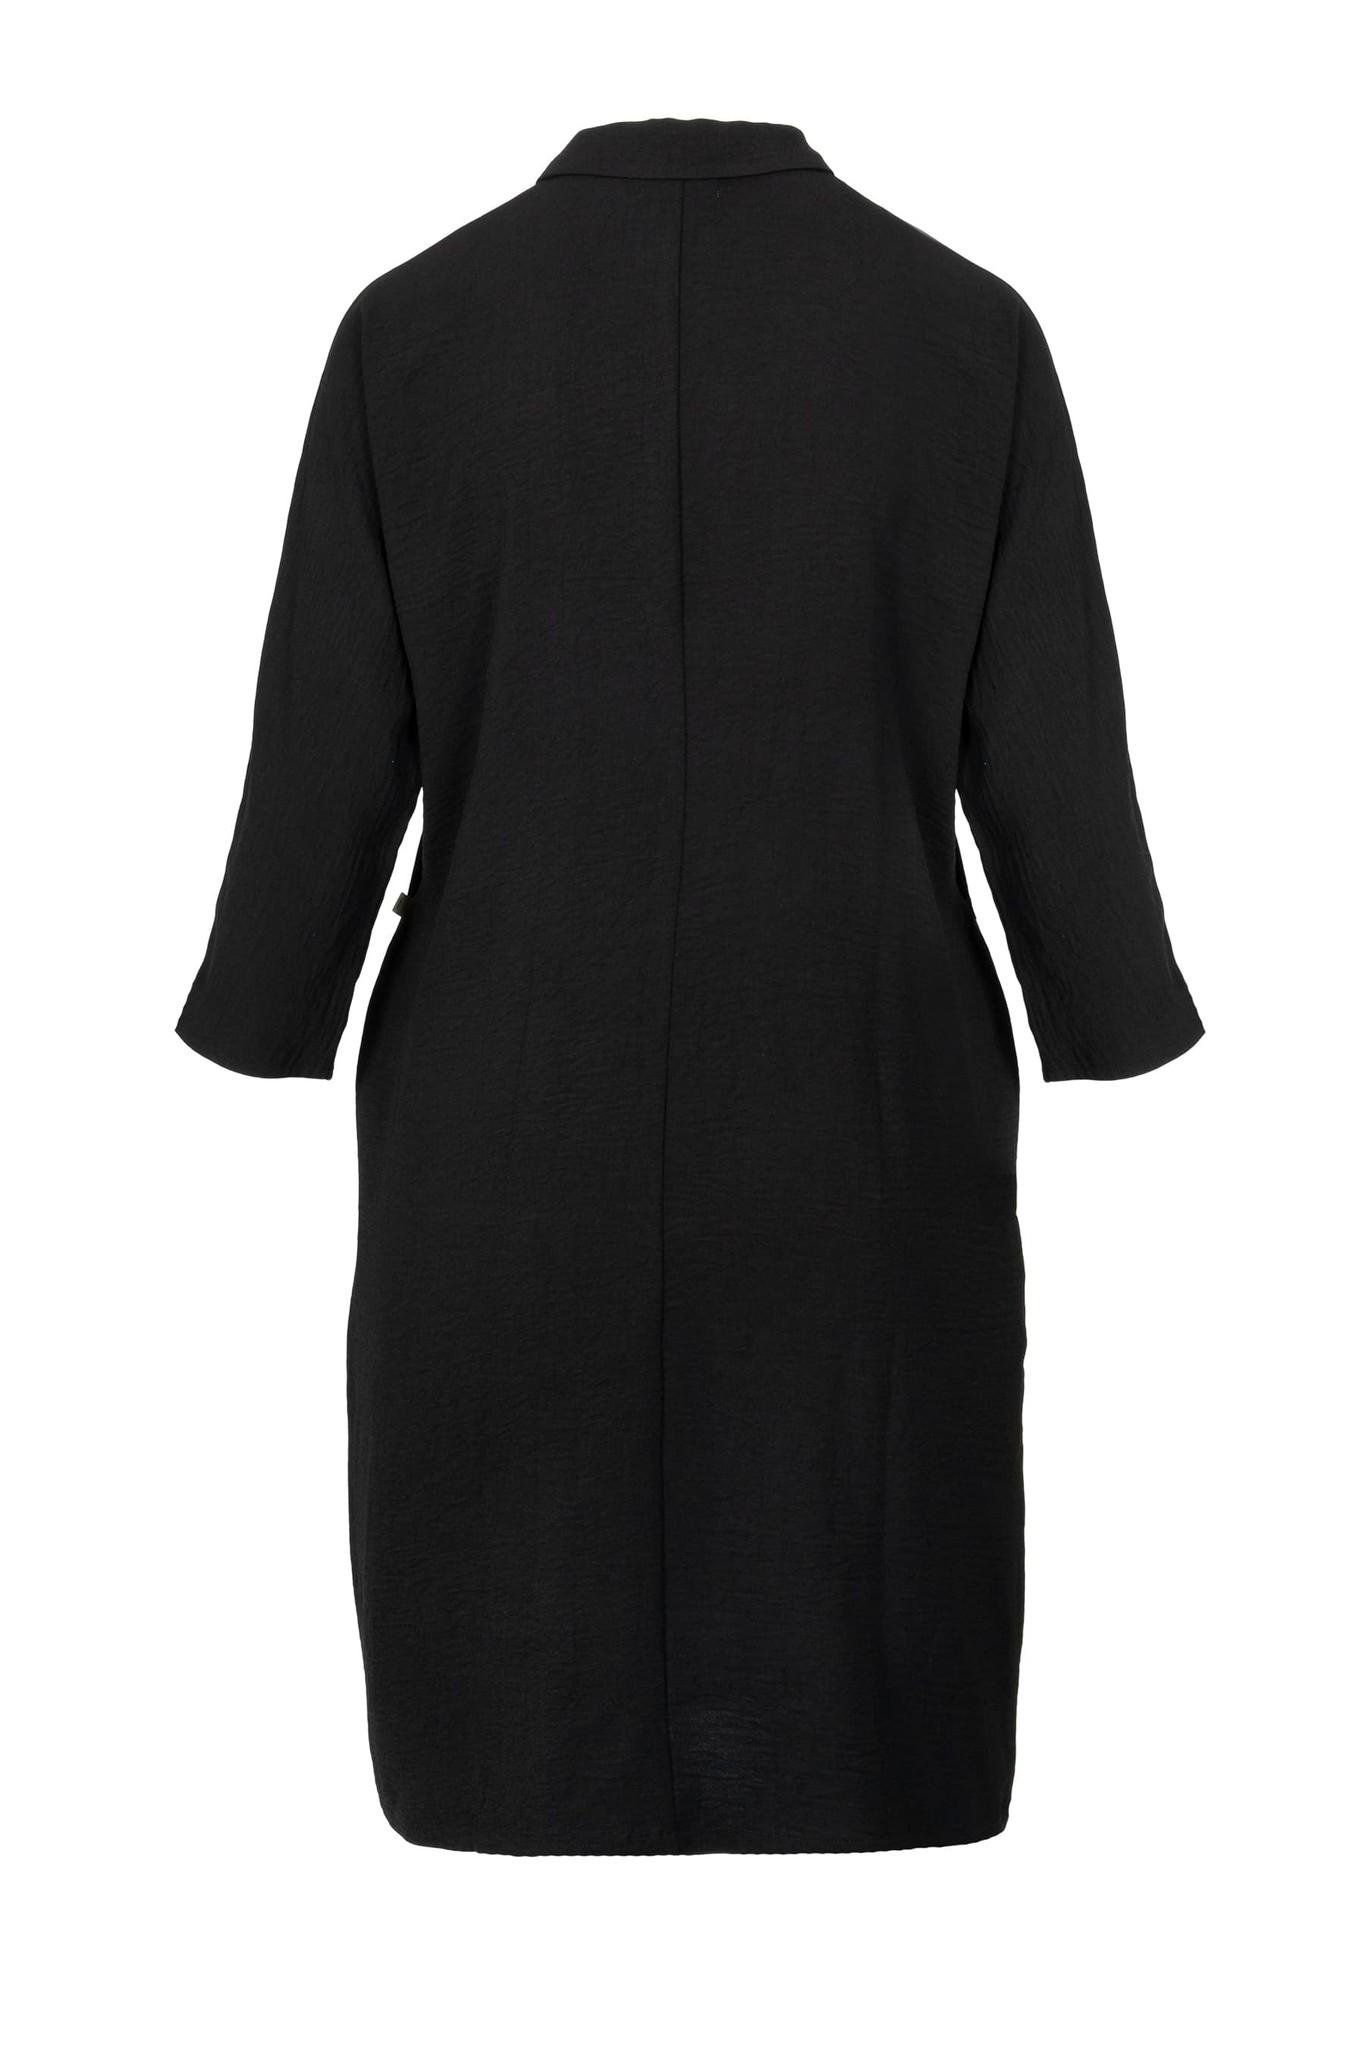 Zusss sportief jurkje - zwart